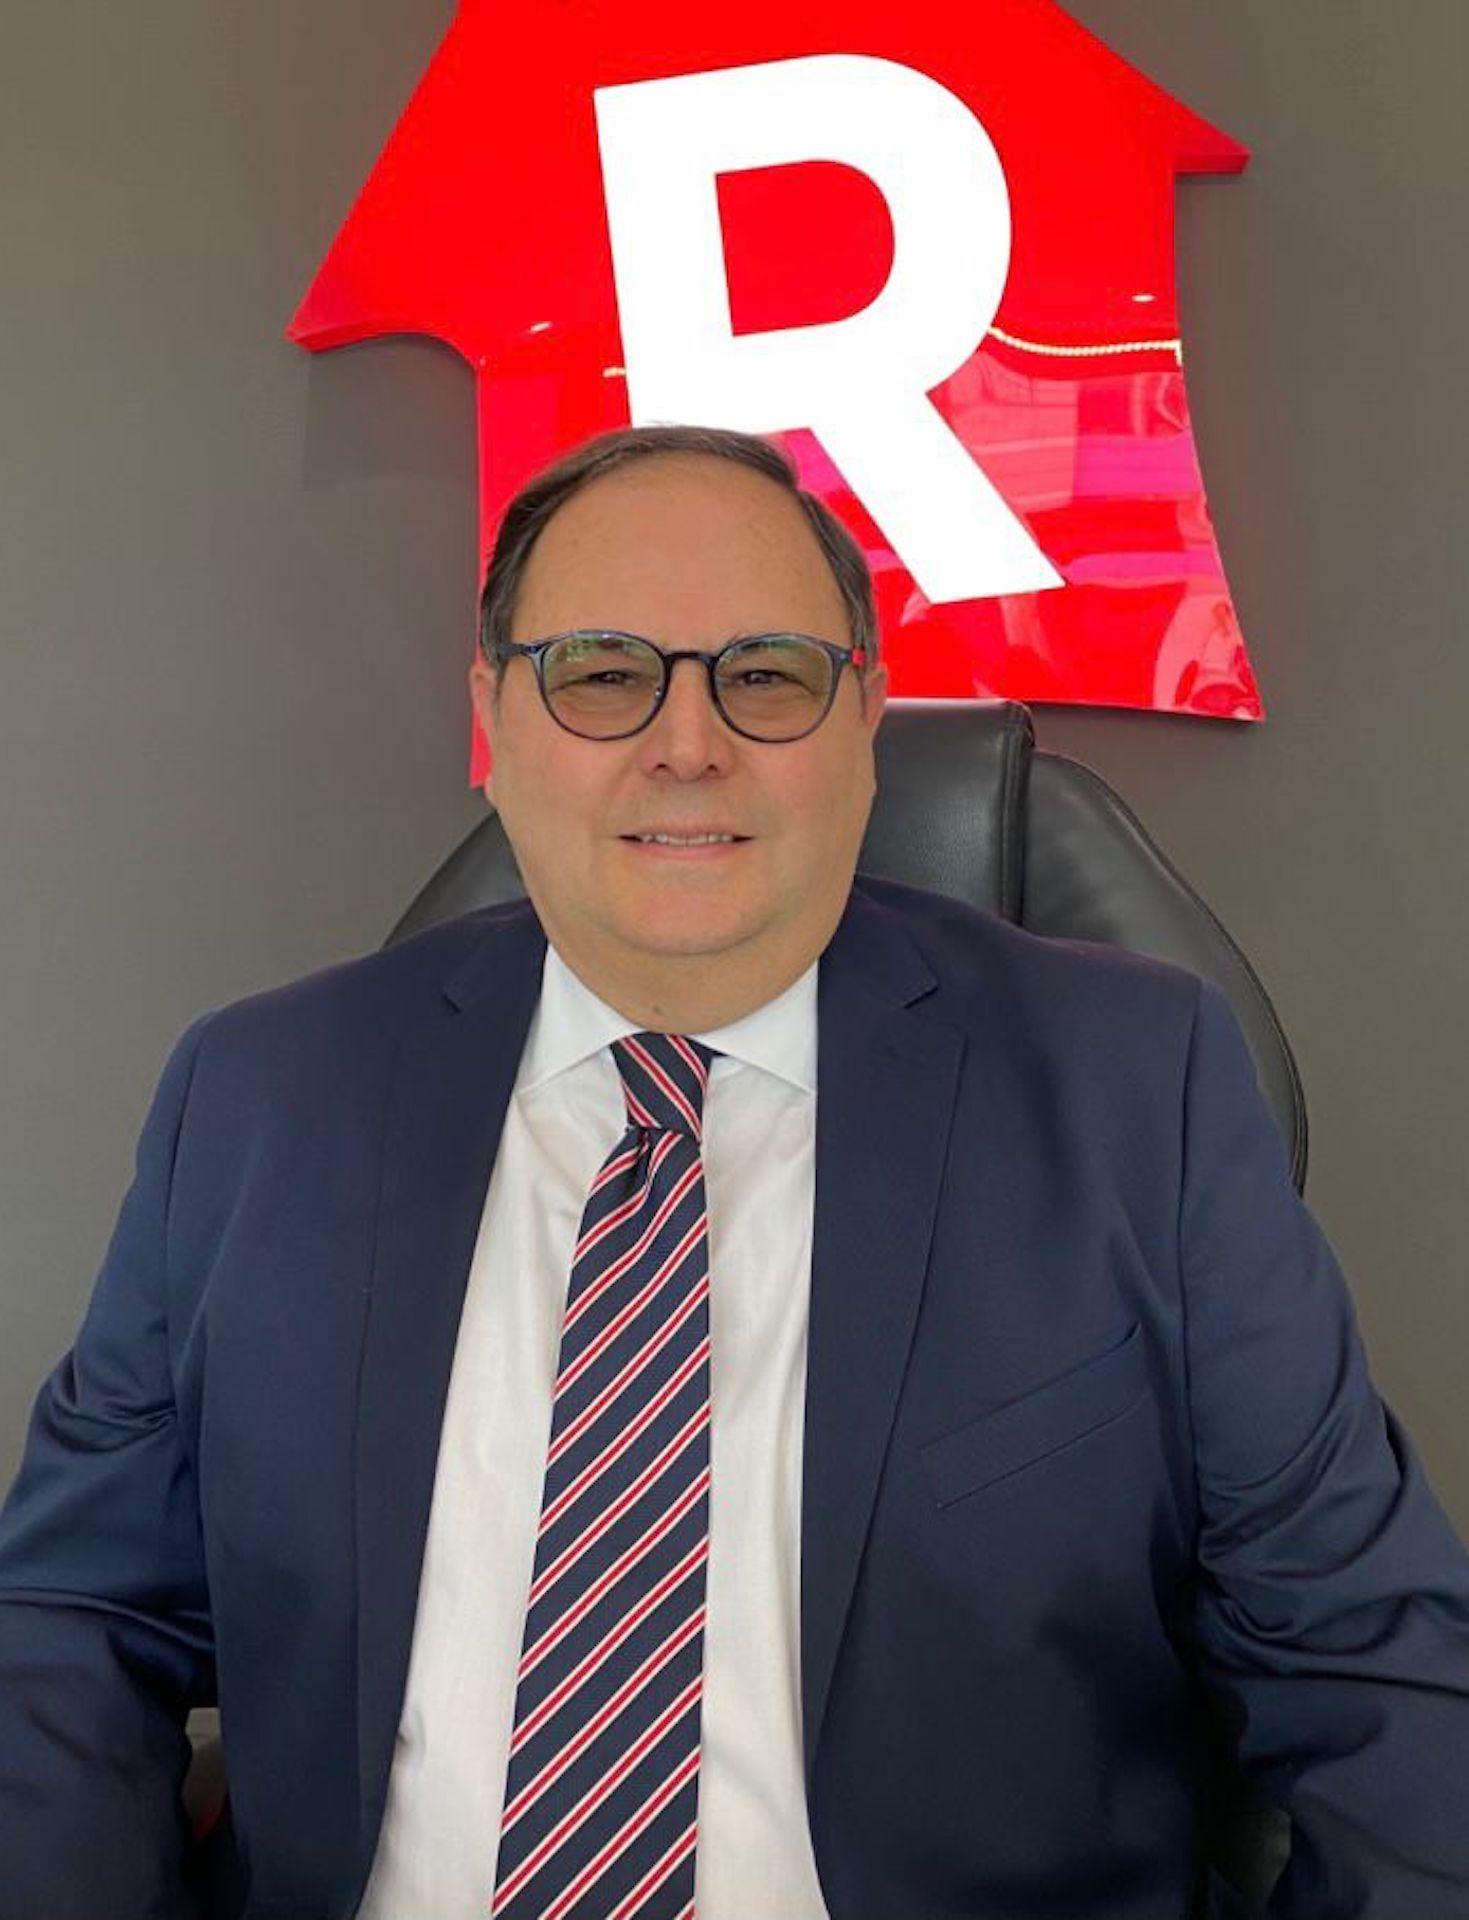 MAURIZIO RICERCATO